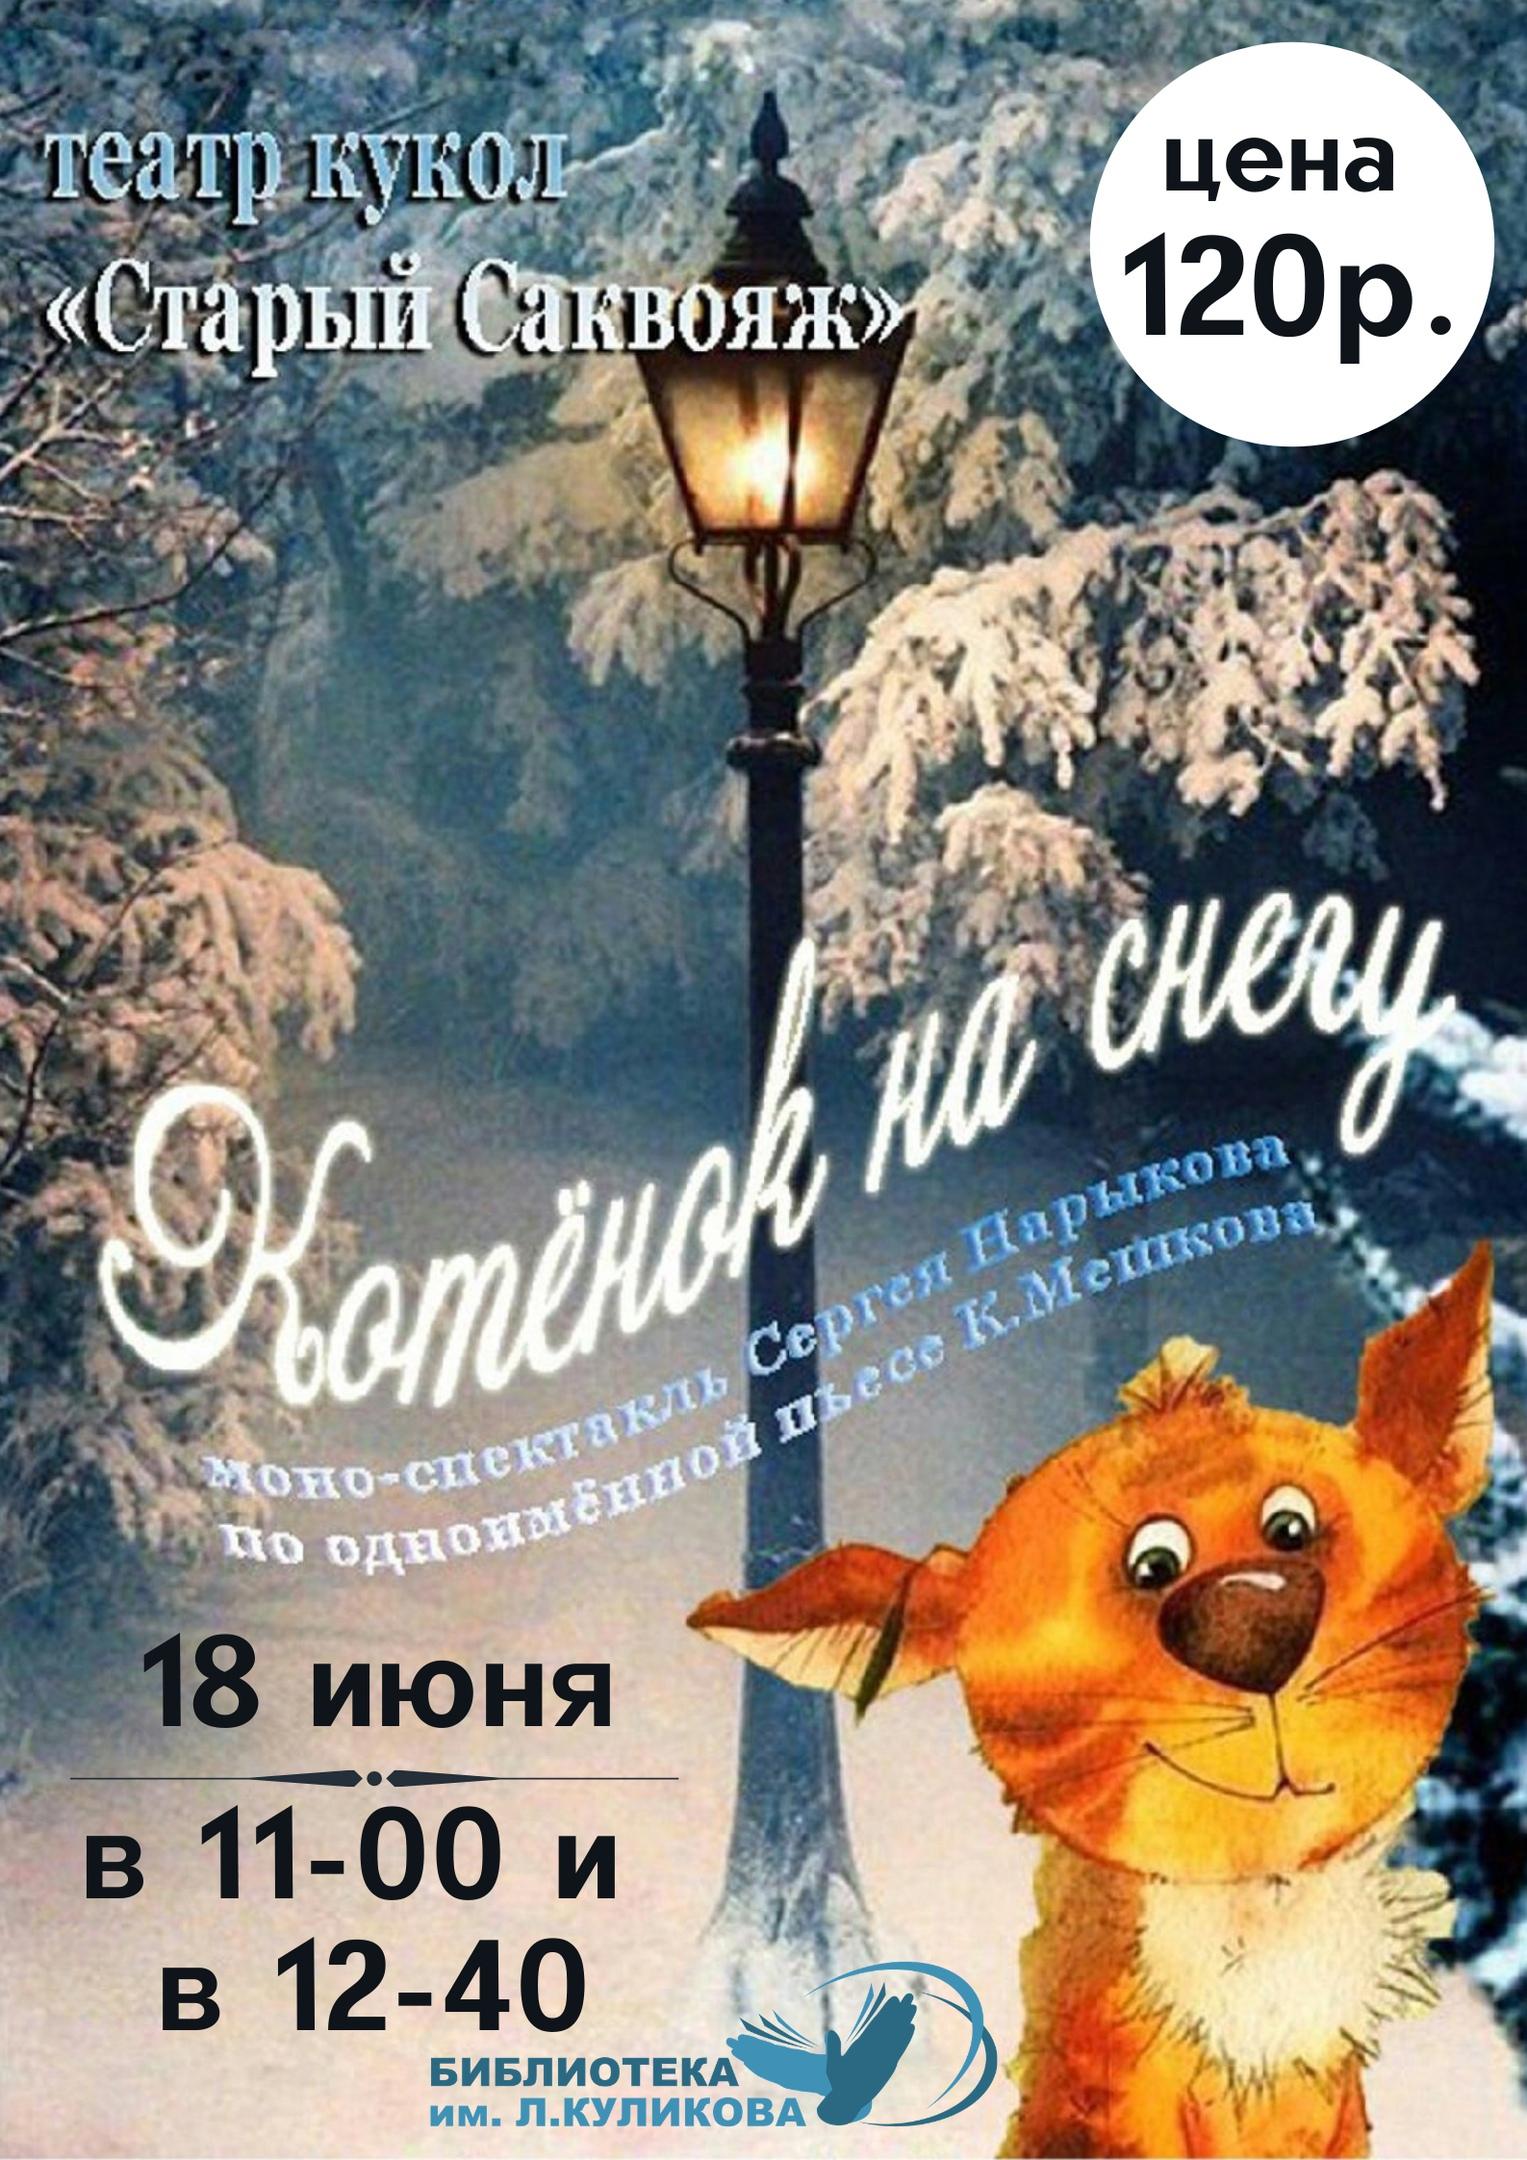 Библиотека им. Л. Куликова Моноспектакль «Котенок на снегу» курган афиша расписание